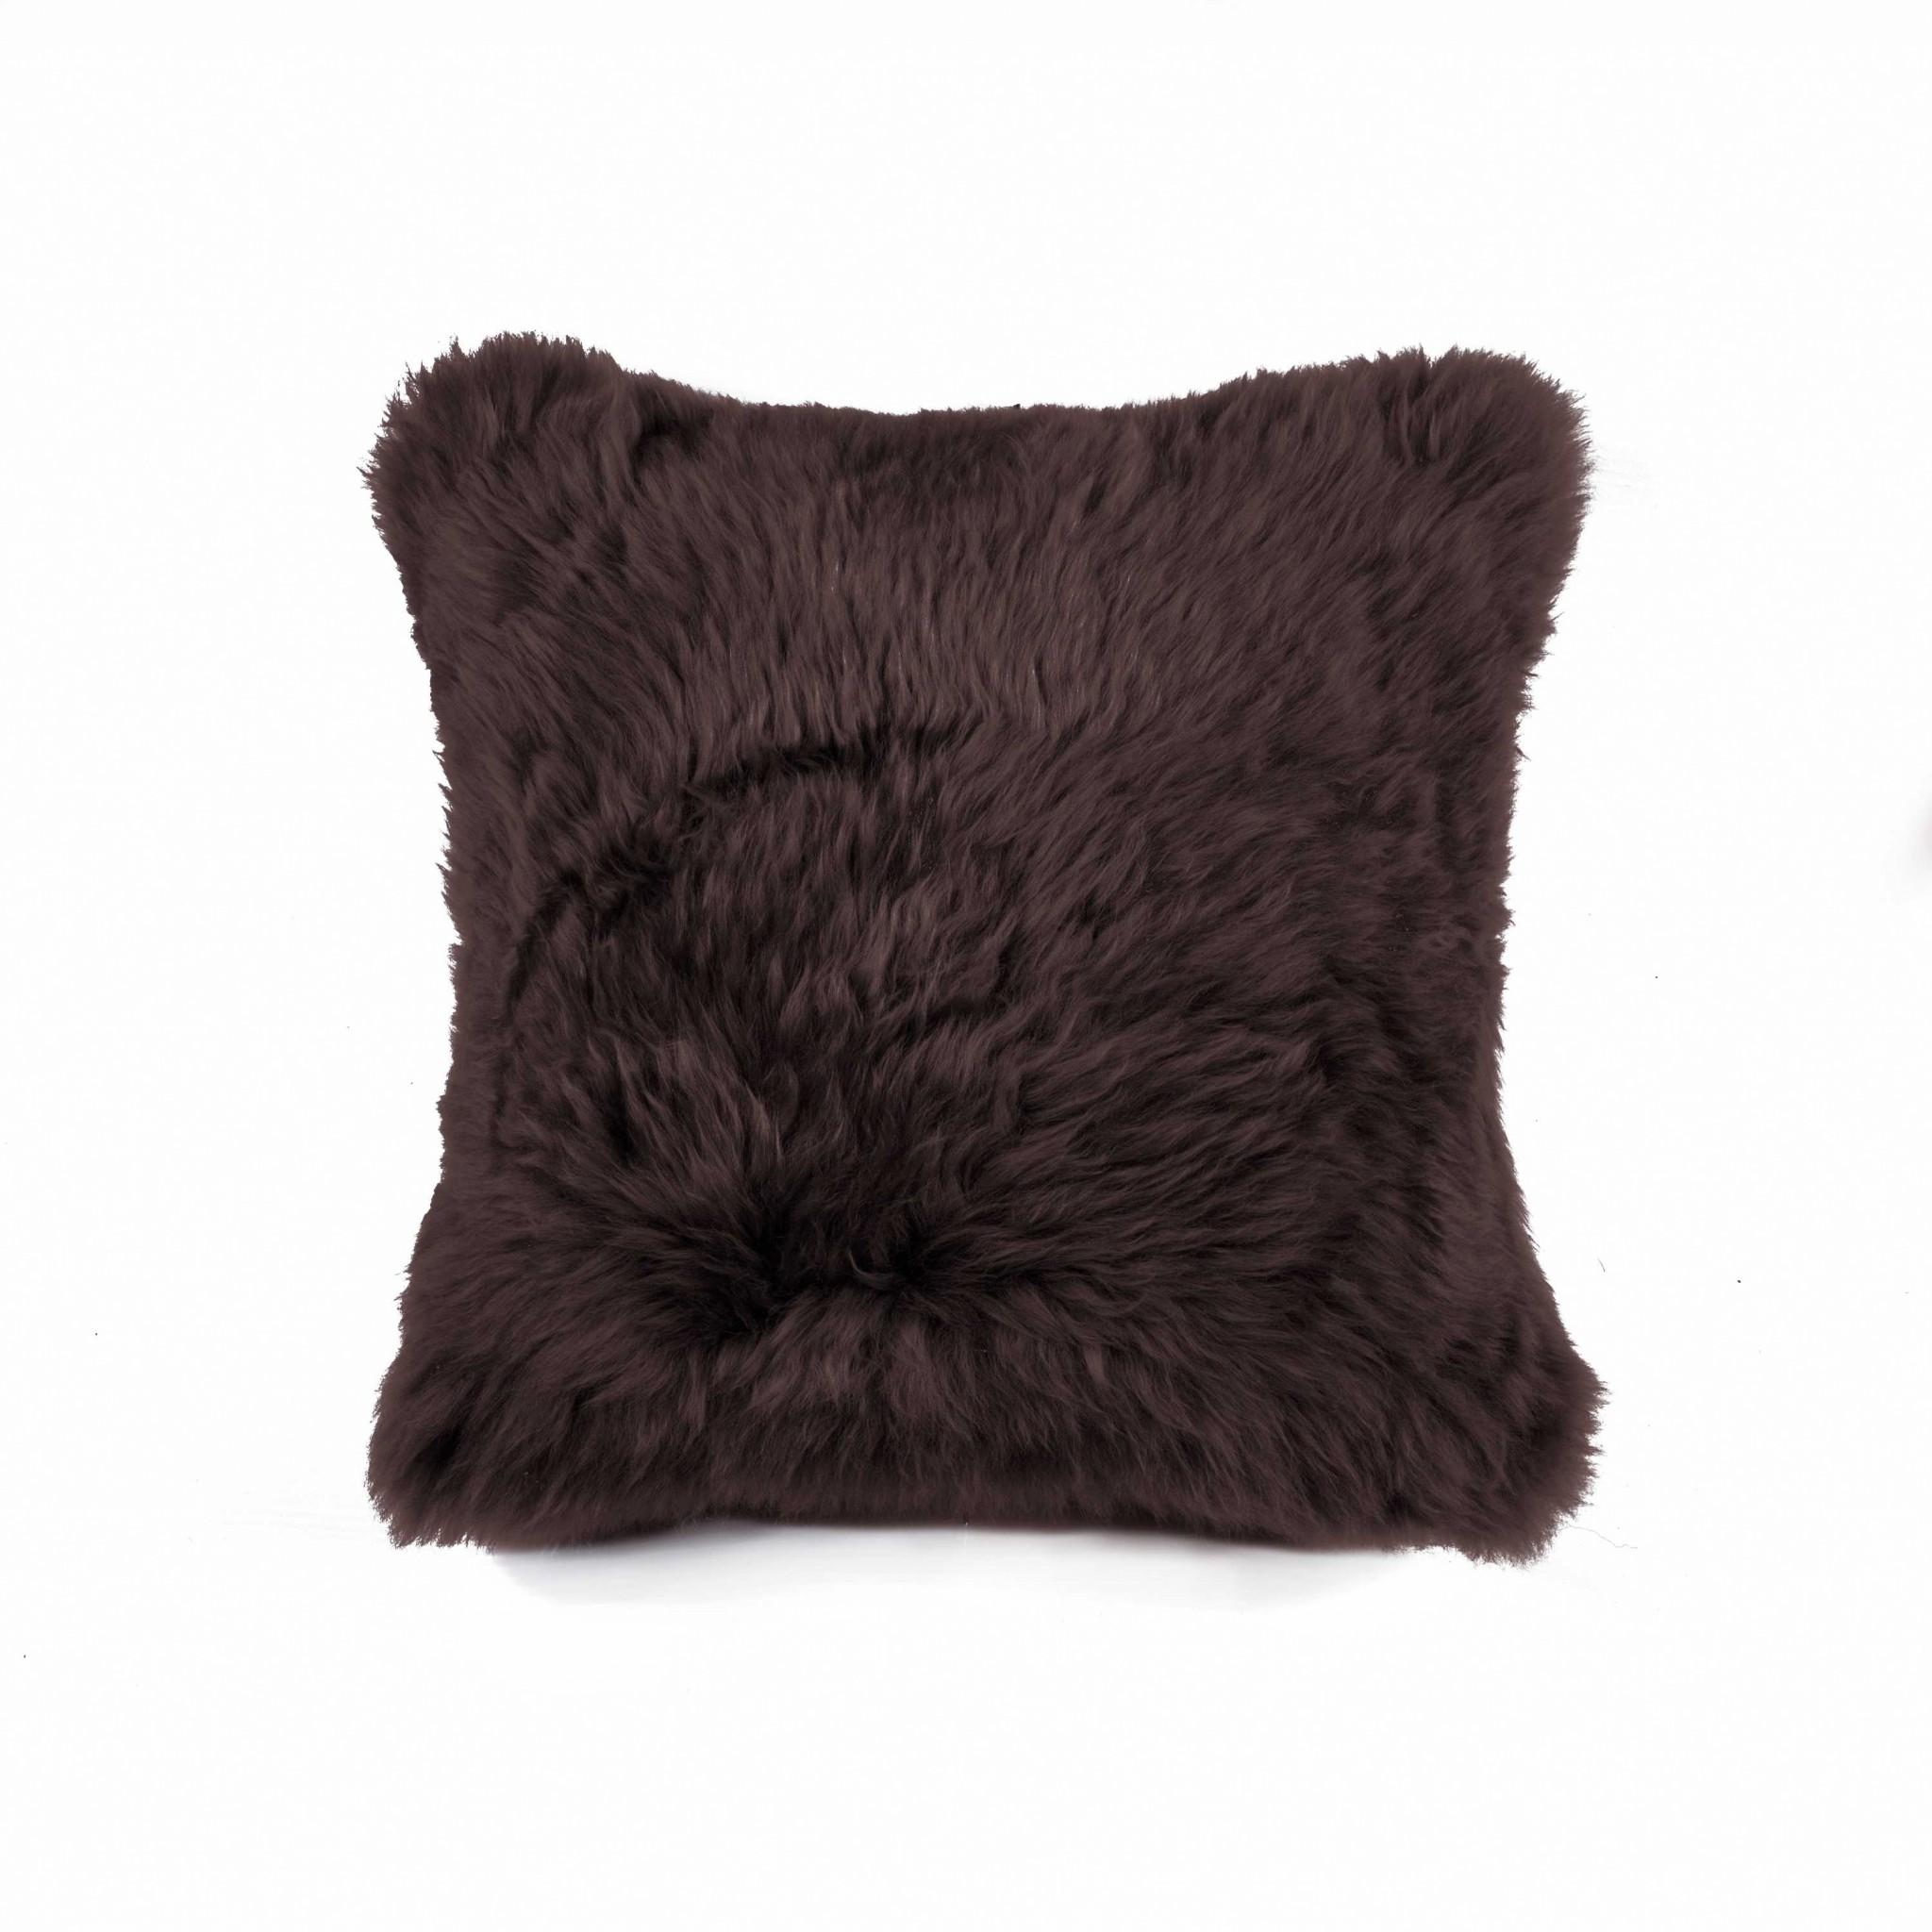 "18"" x 18"" x 5"" Chocolate Sheepskin - Pillow"